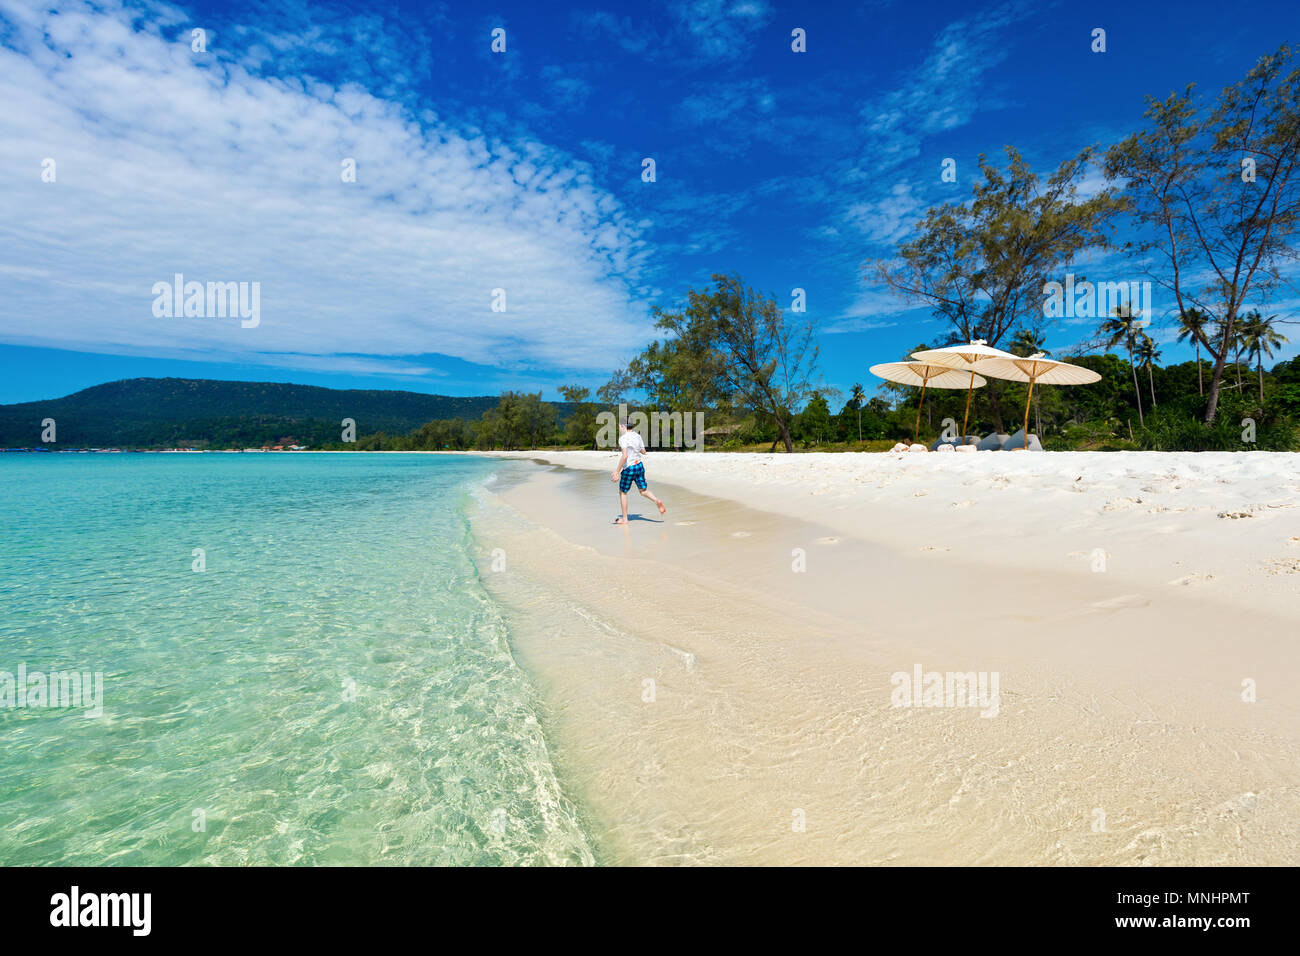 Cute teenage boy at beach during summer vacation - Stock Image